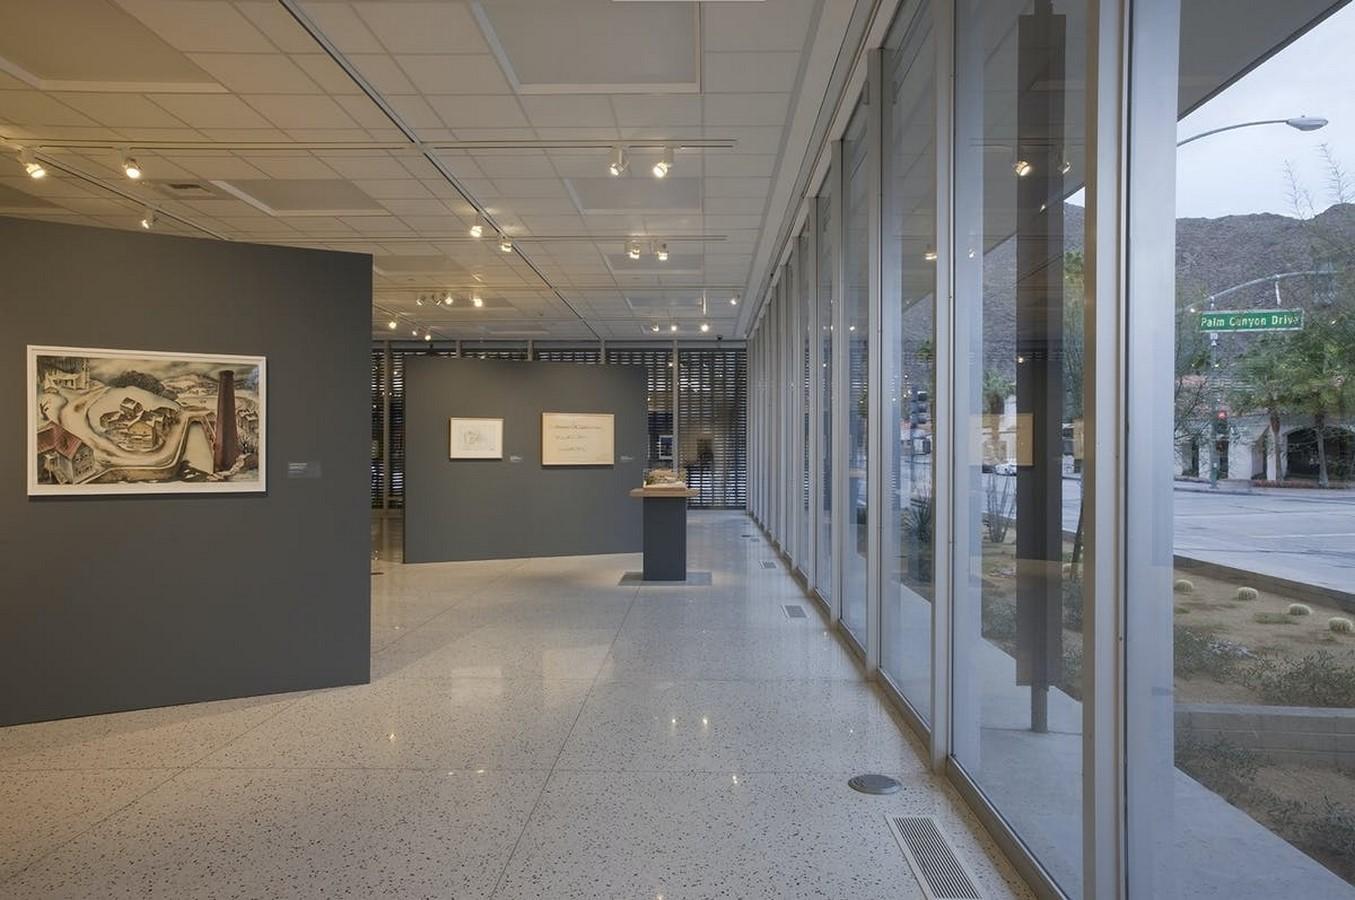 PALM SPRINGS ART MUSEUM - Sheet